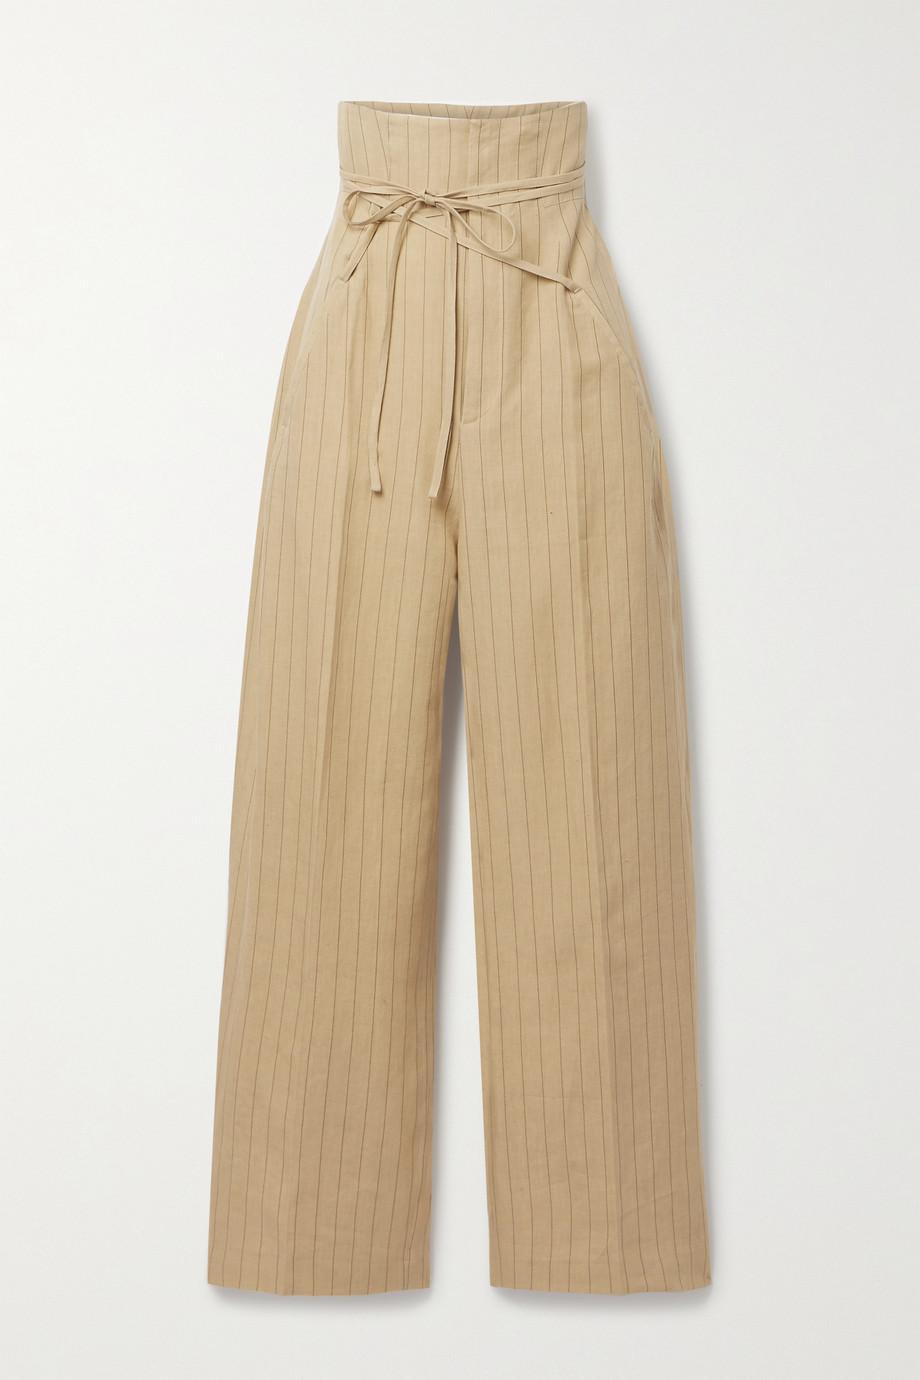 Jacquemus Novio belted pinstriped linen wide-leg pants